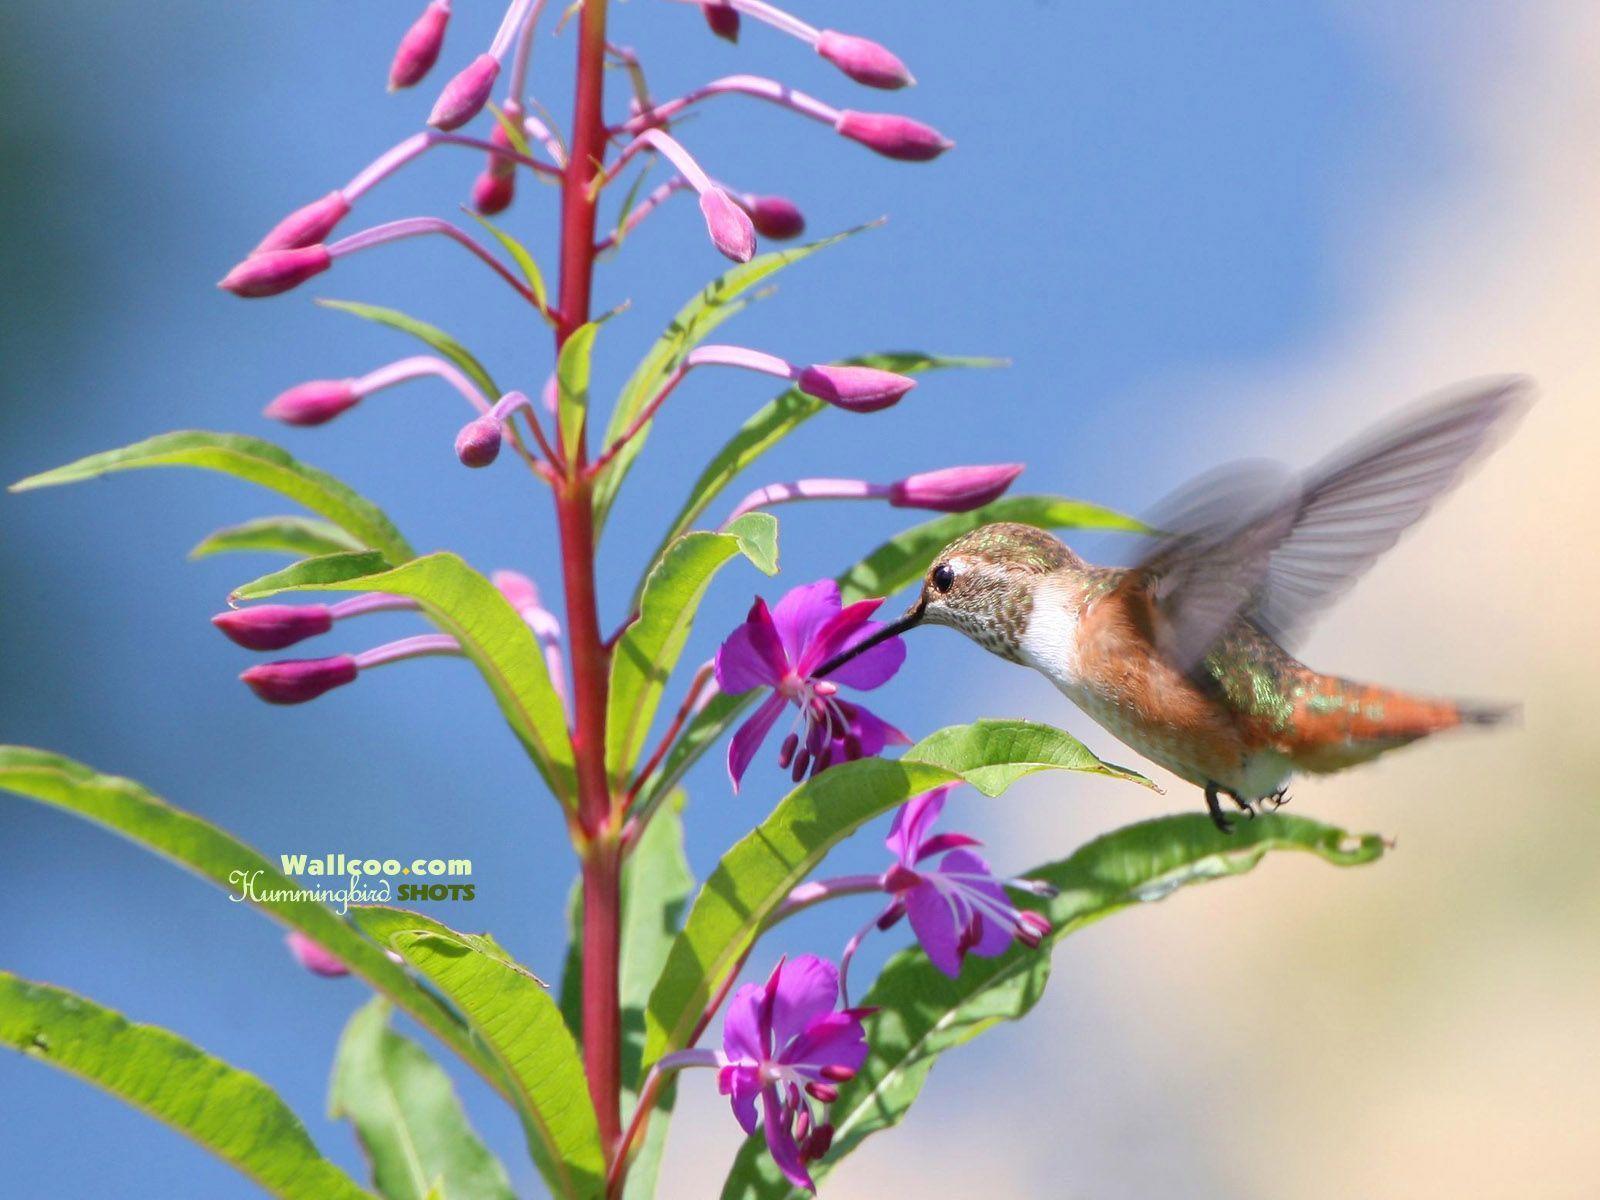 hummingbird wallpaper for computer